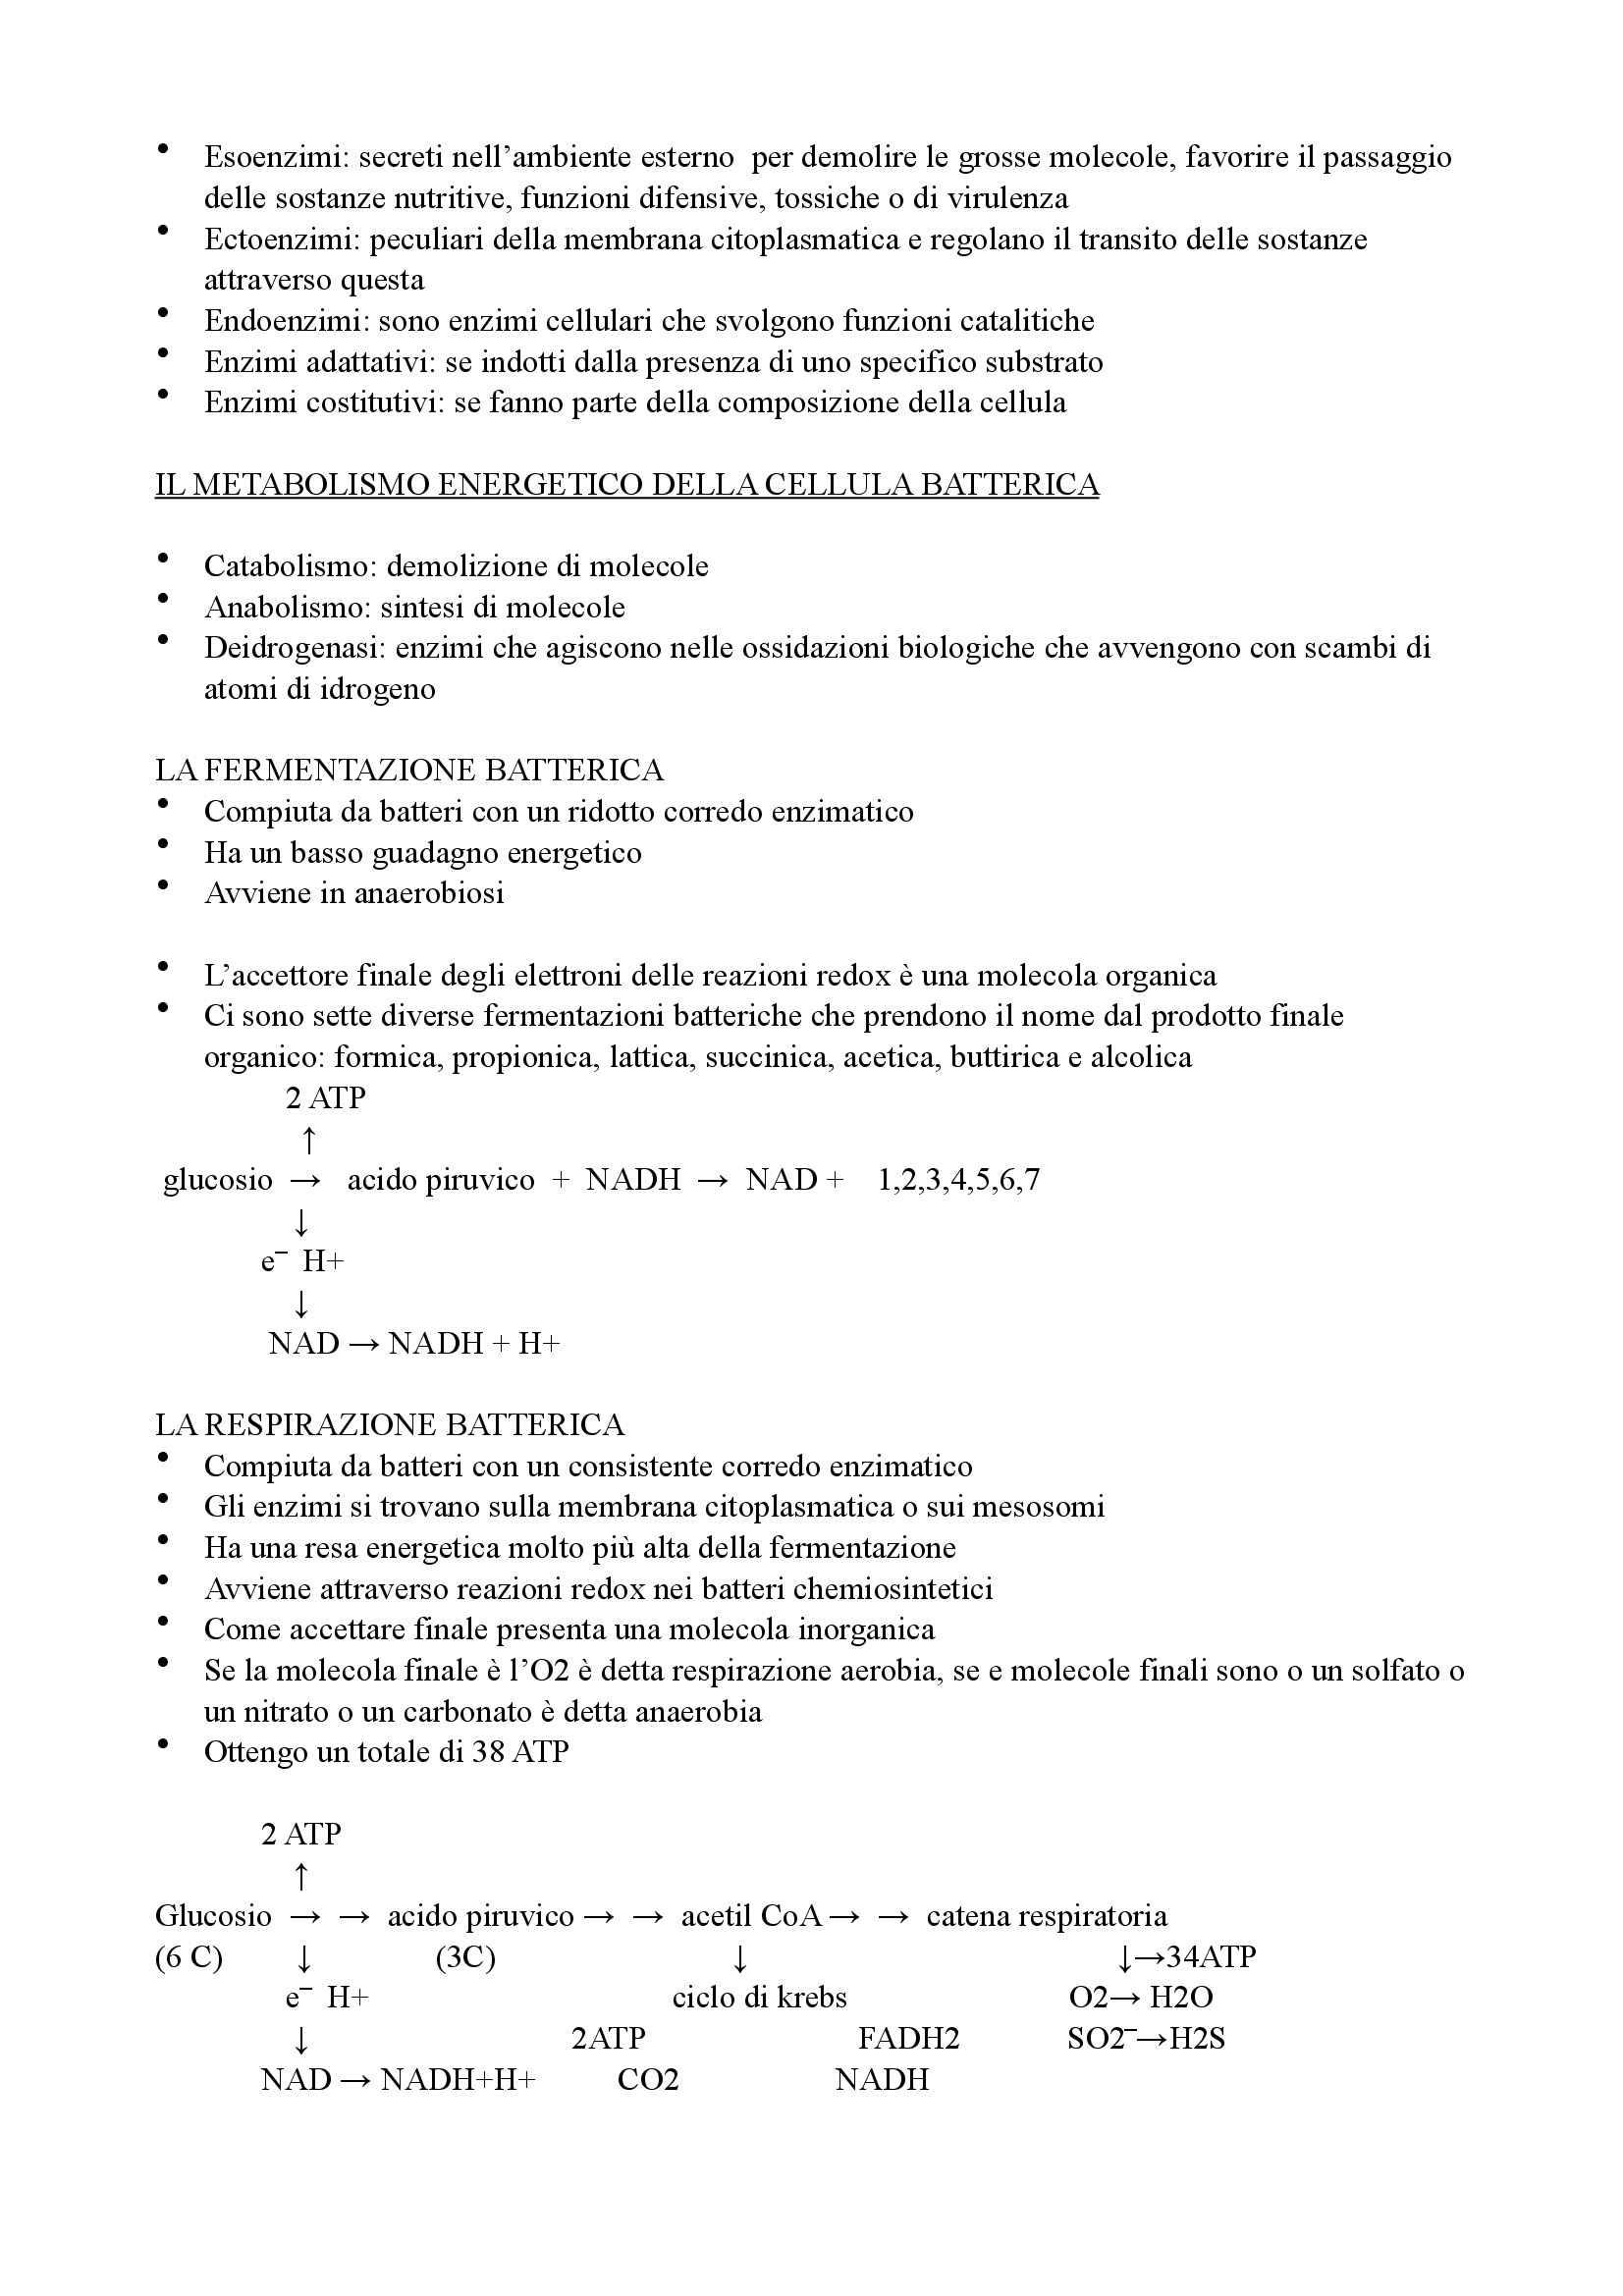 Microbiologia - Batteri Pag. 6